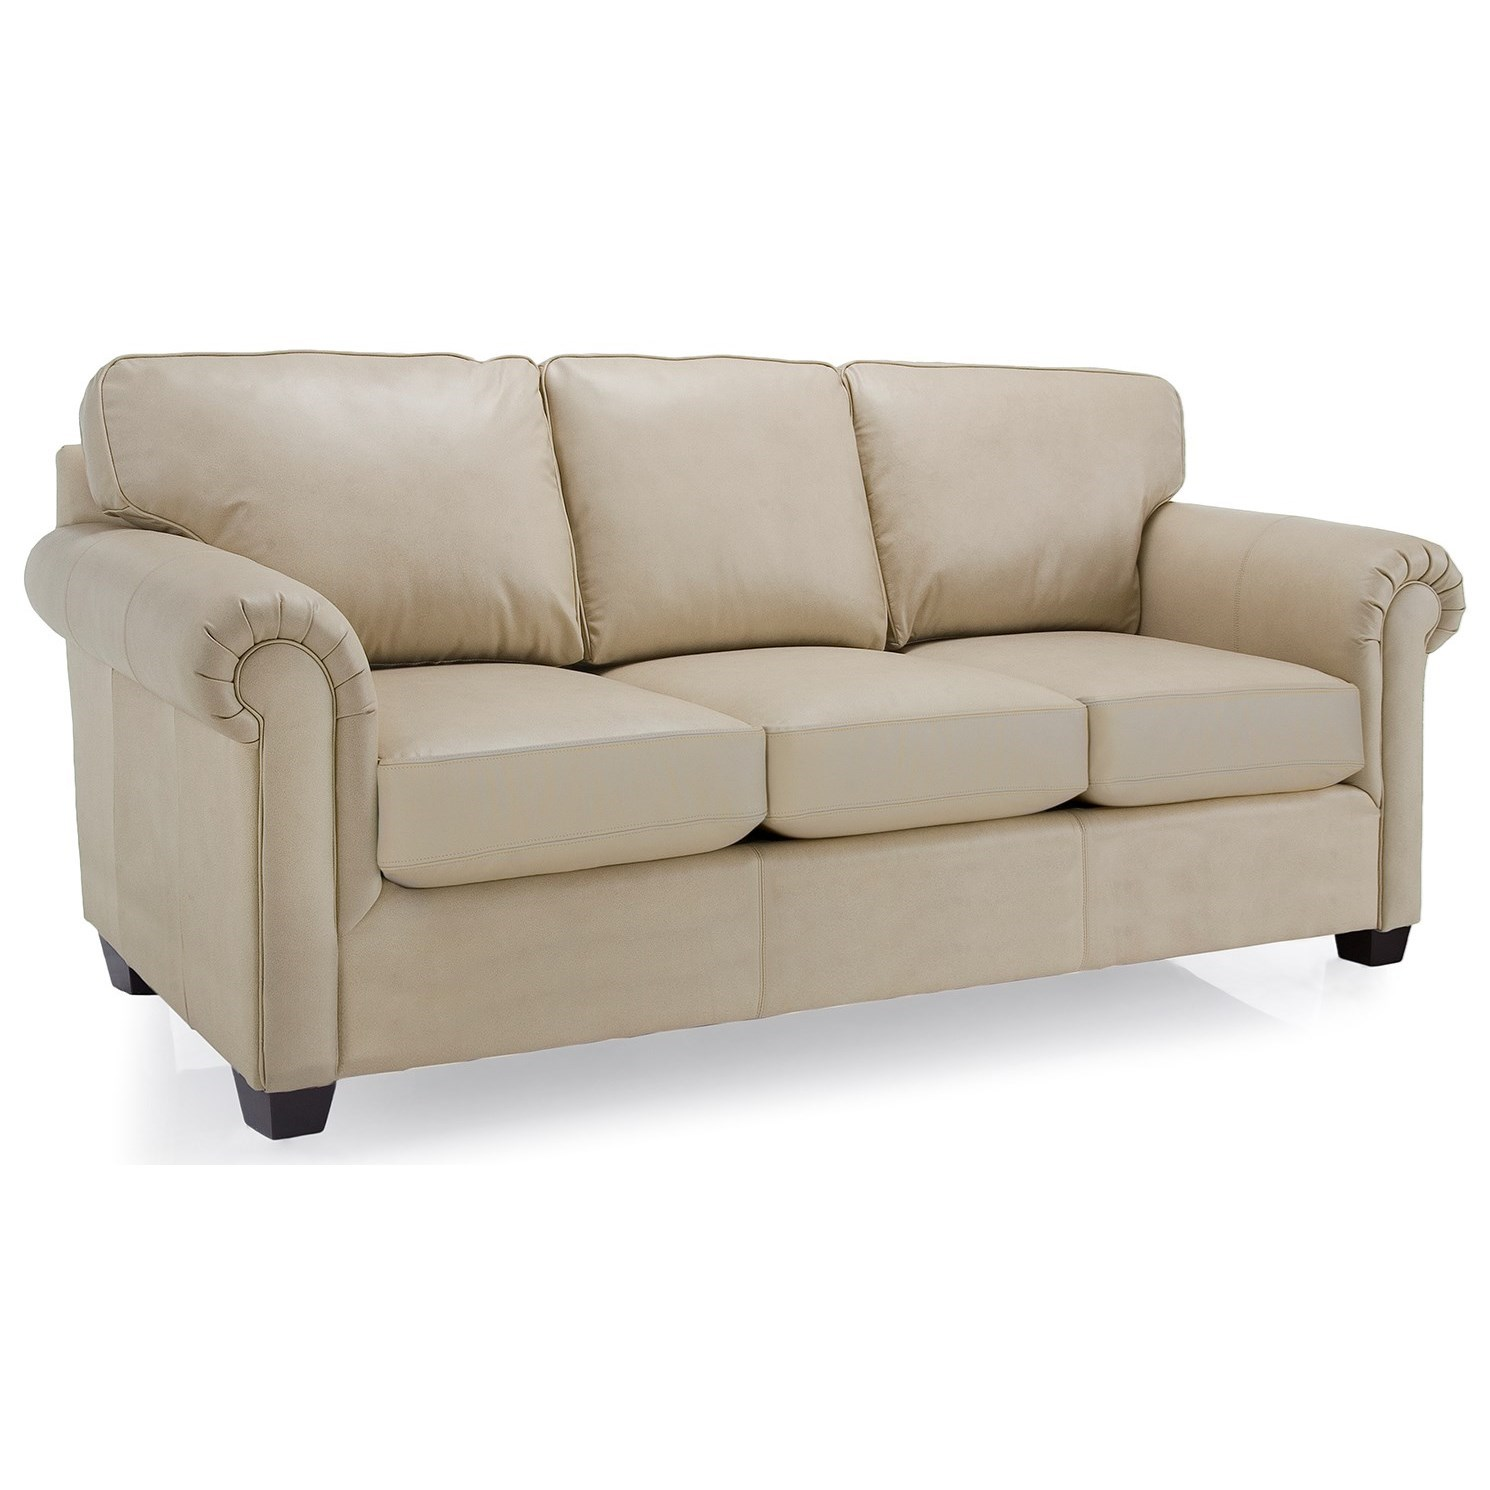 3003 Sofa by Decor-Rest at Johnny Janosik